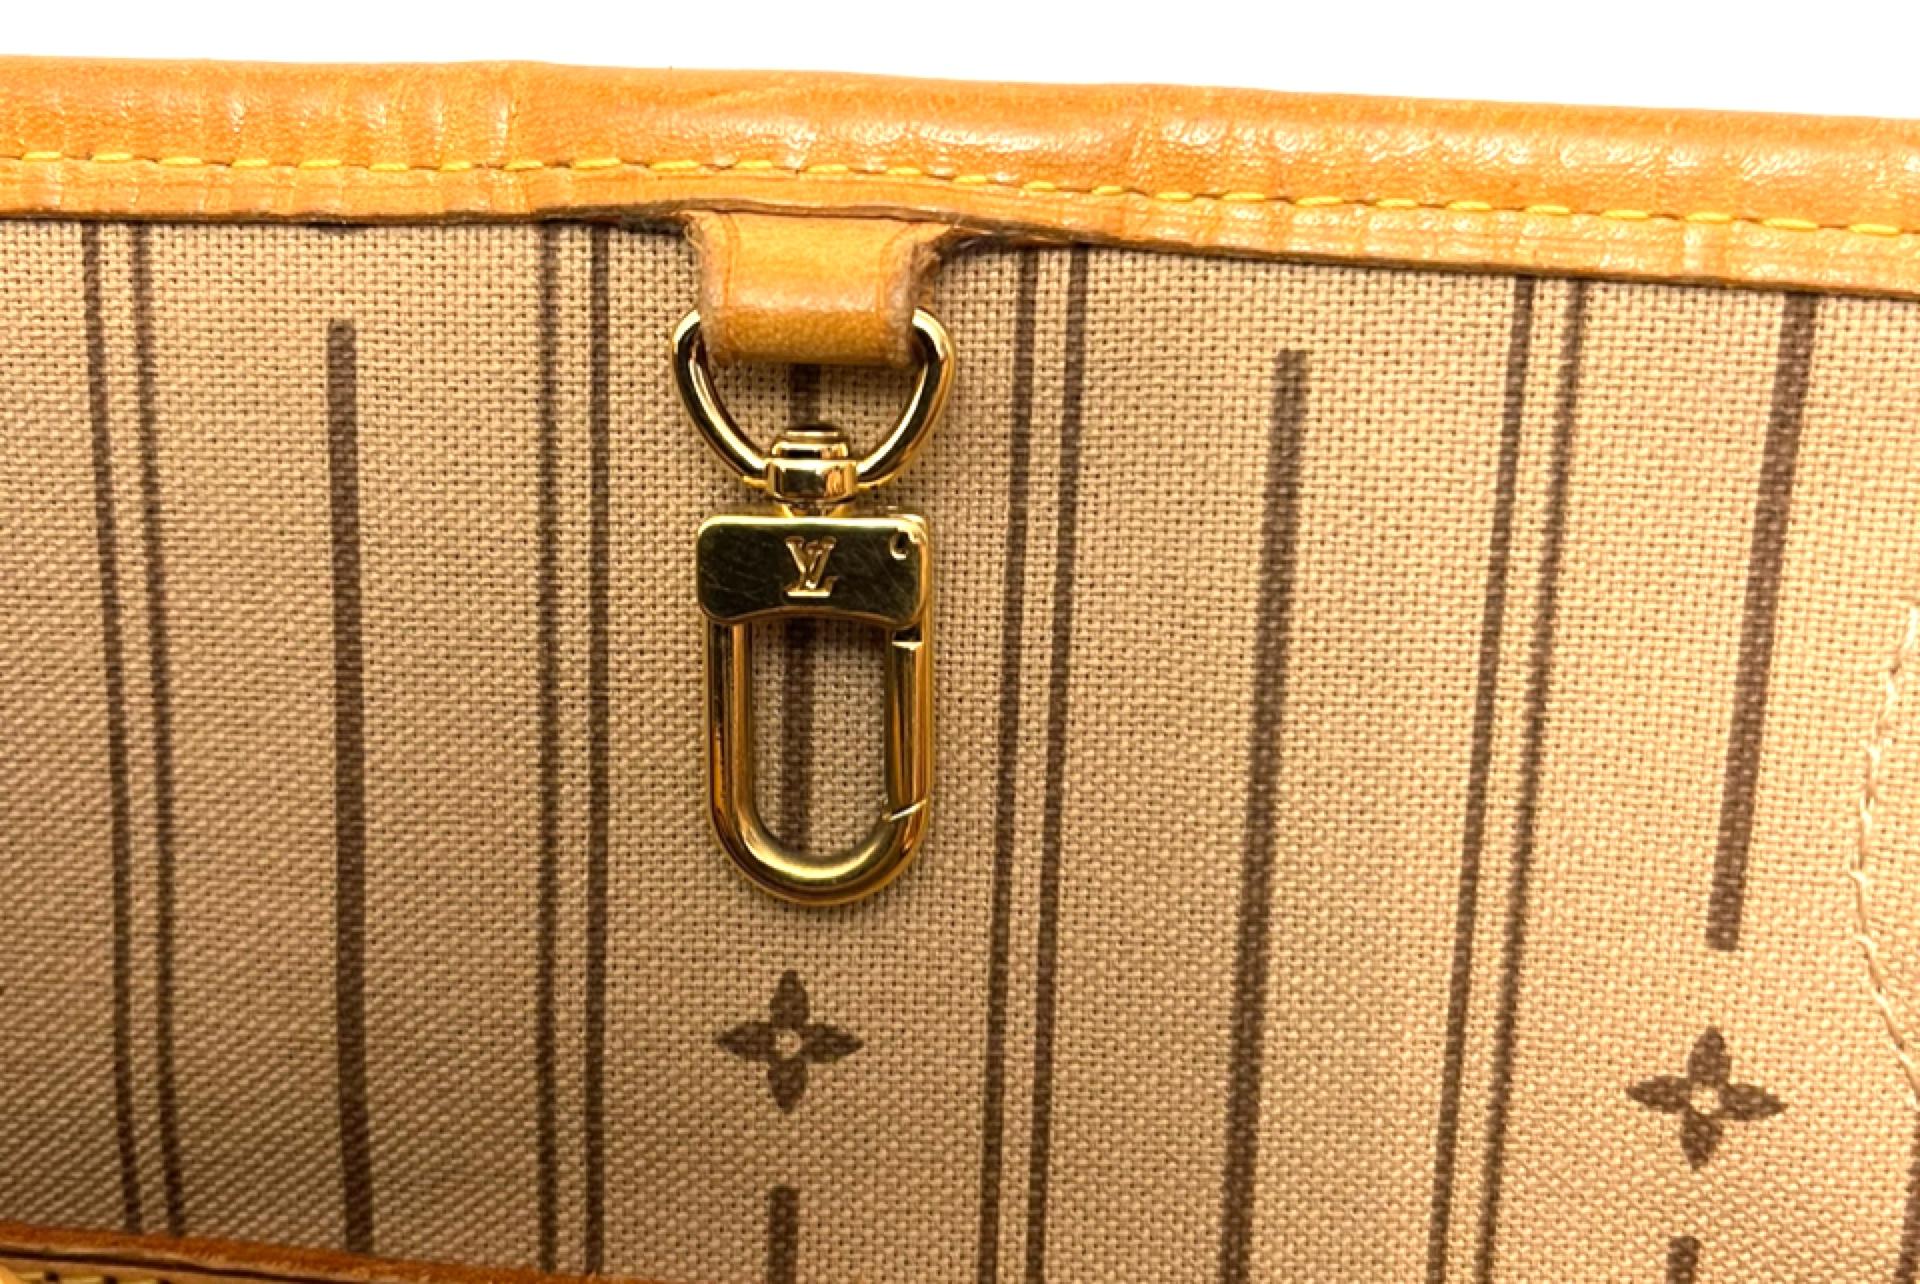 Louis Vuitton Neverfull PM Monogram Canvas Bag